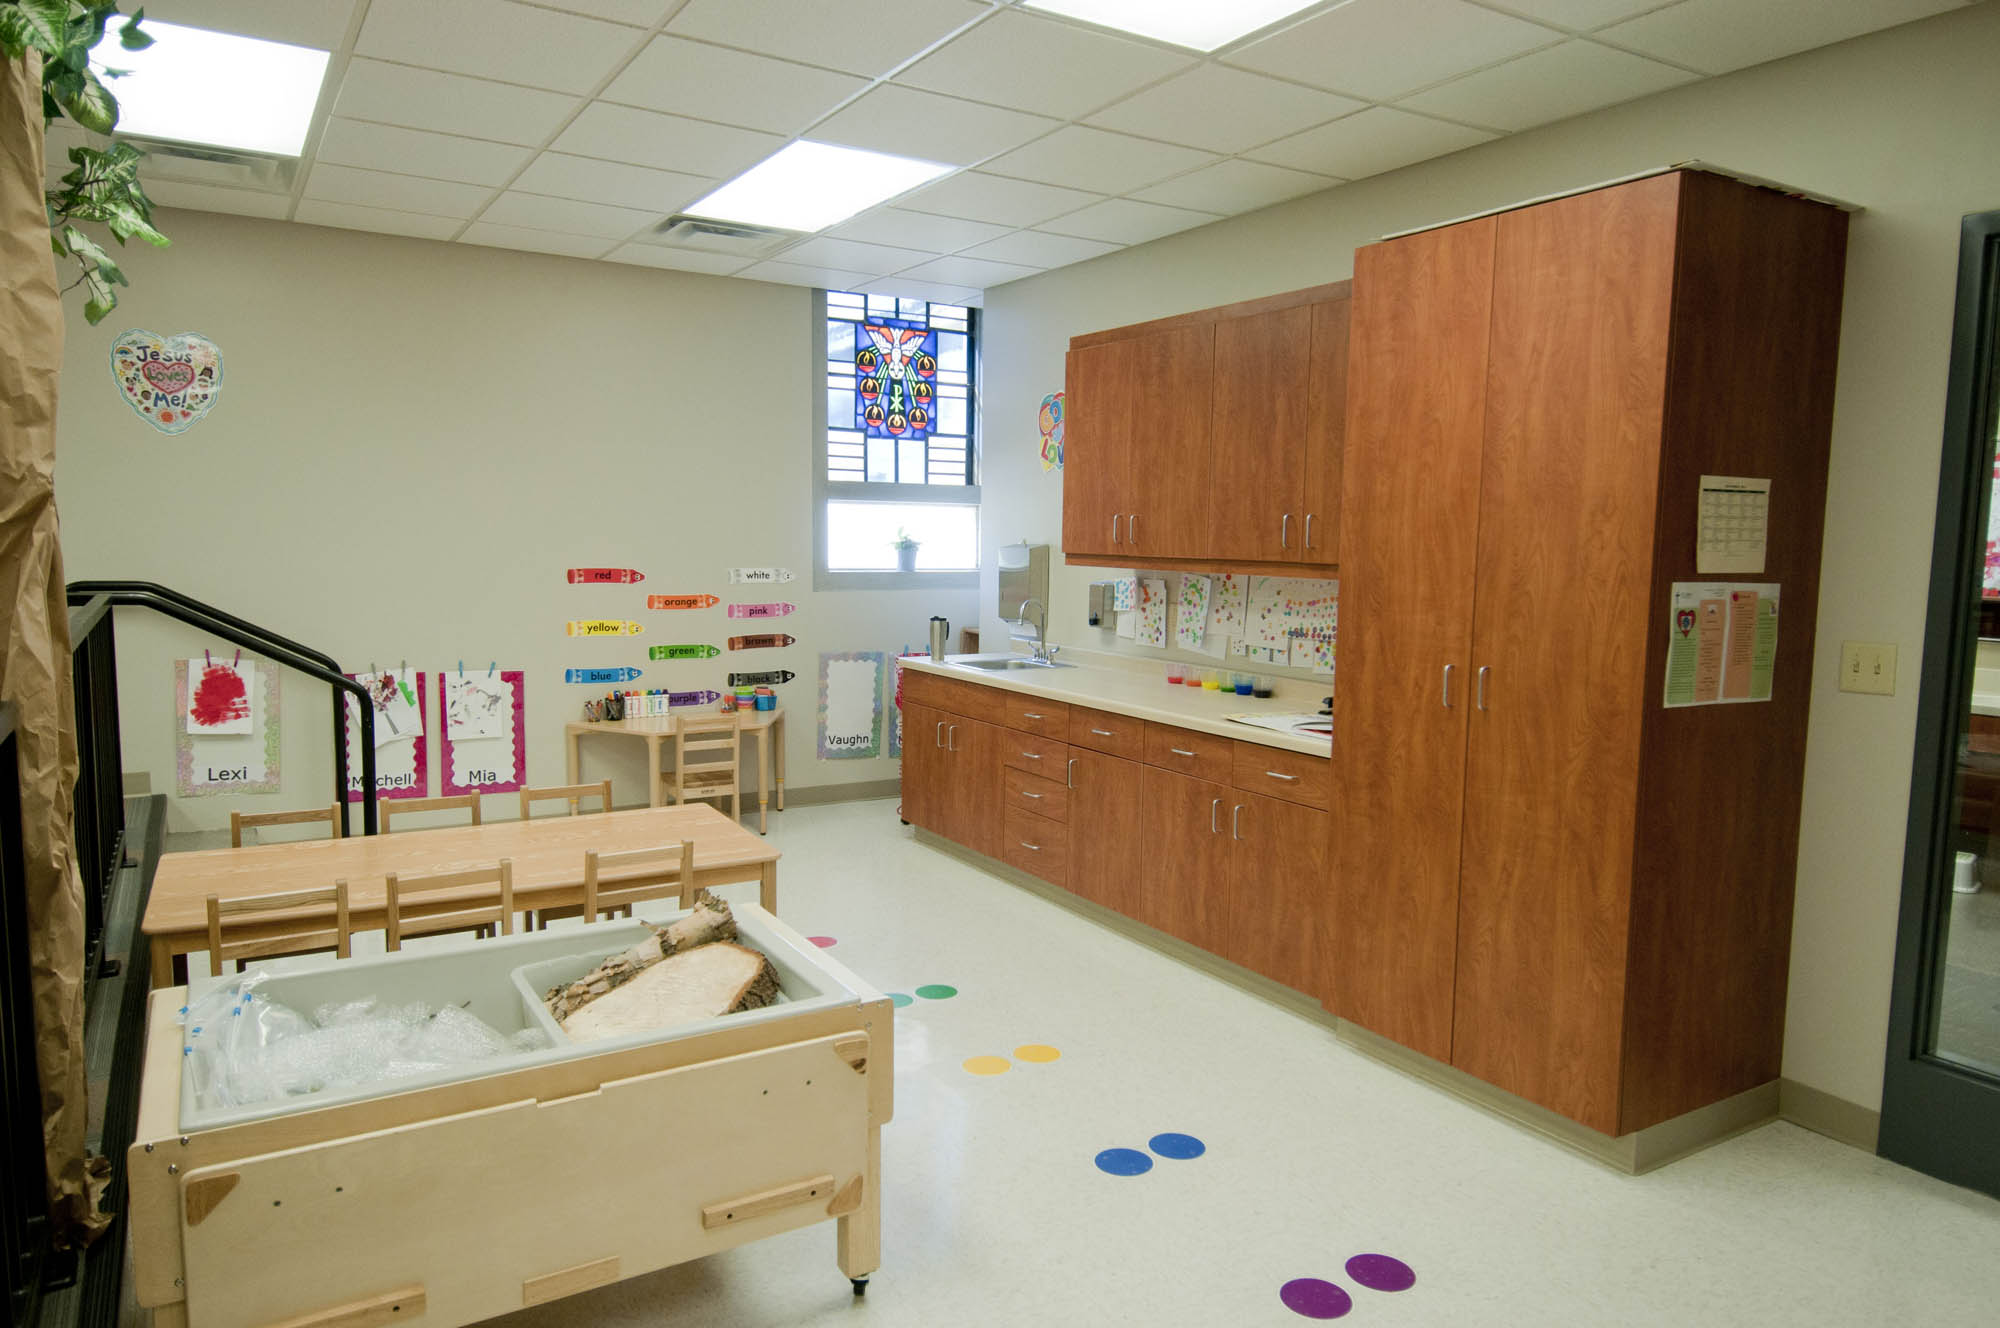 3K-Classroom-Cabinets.jpg